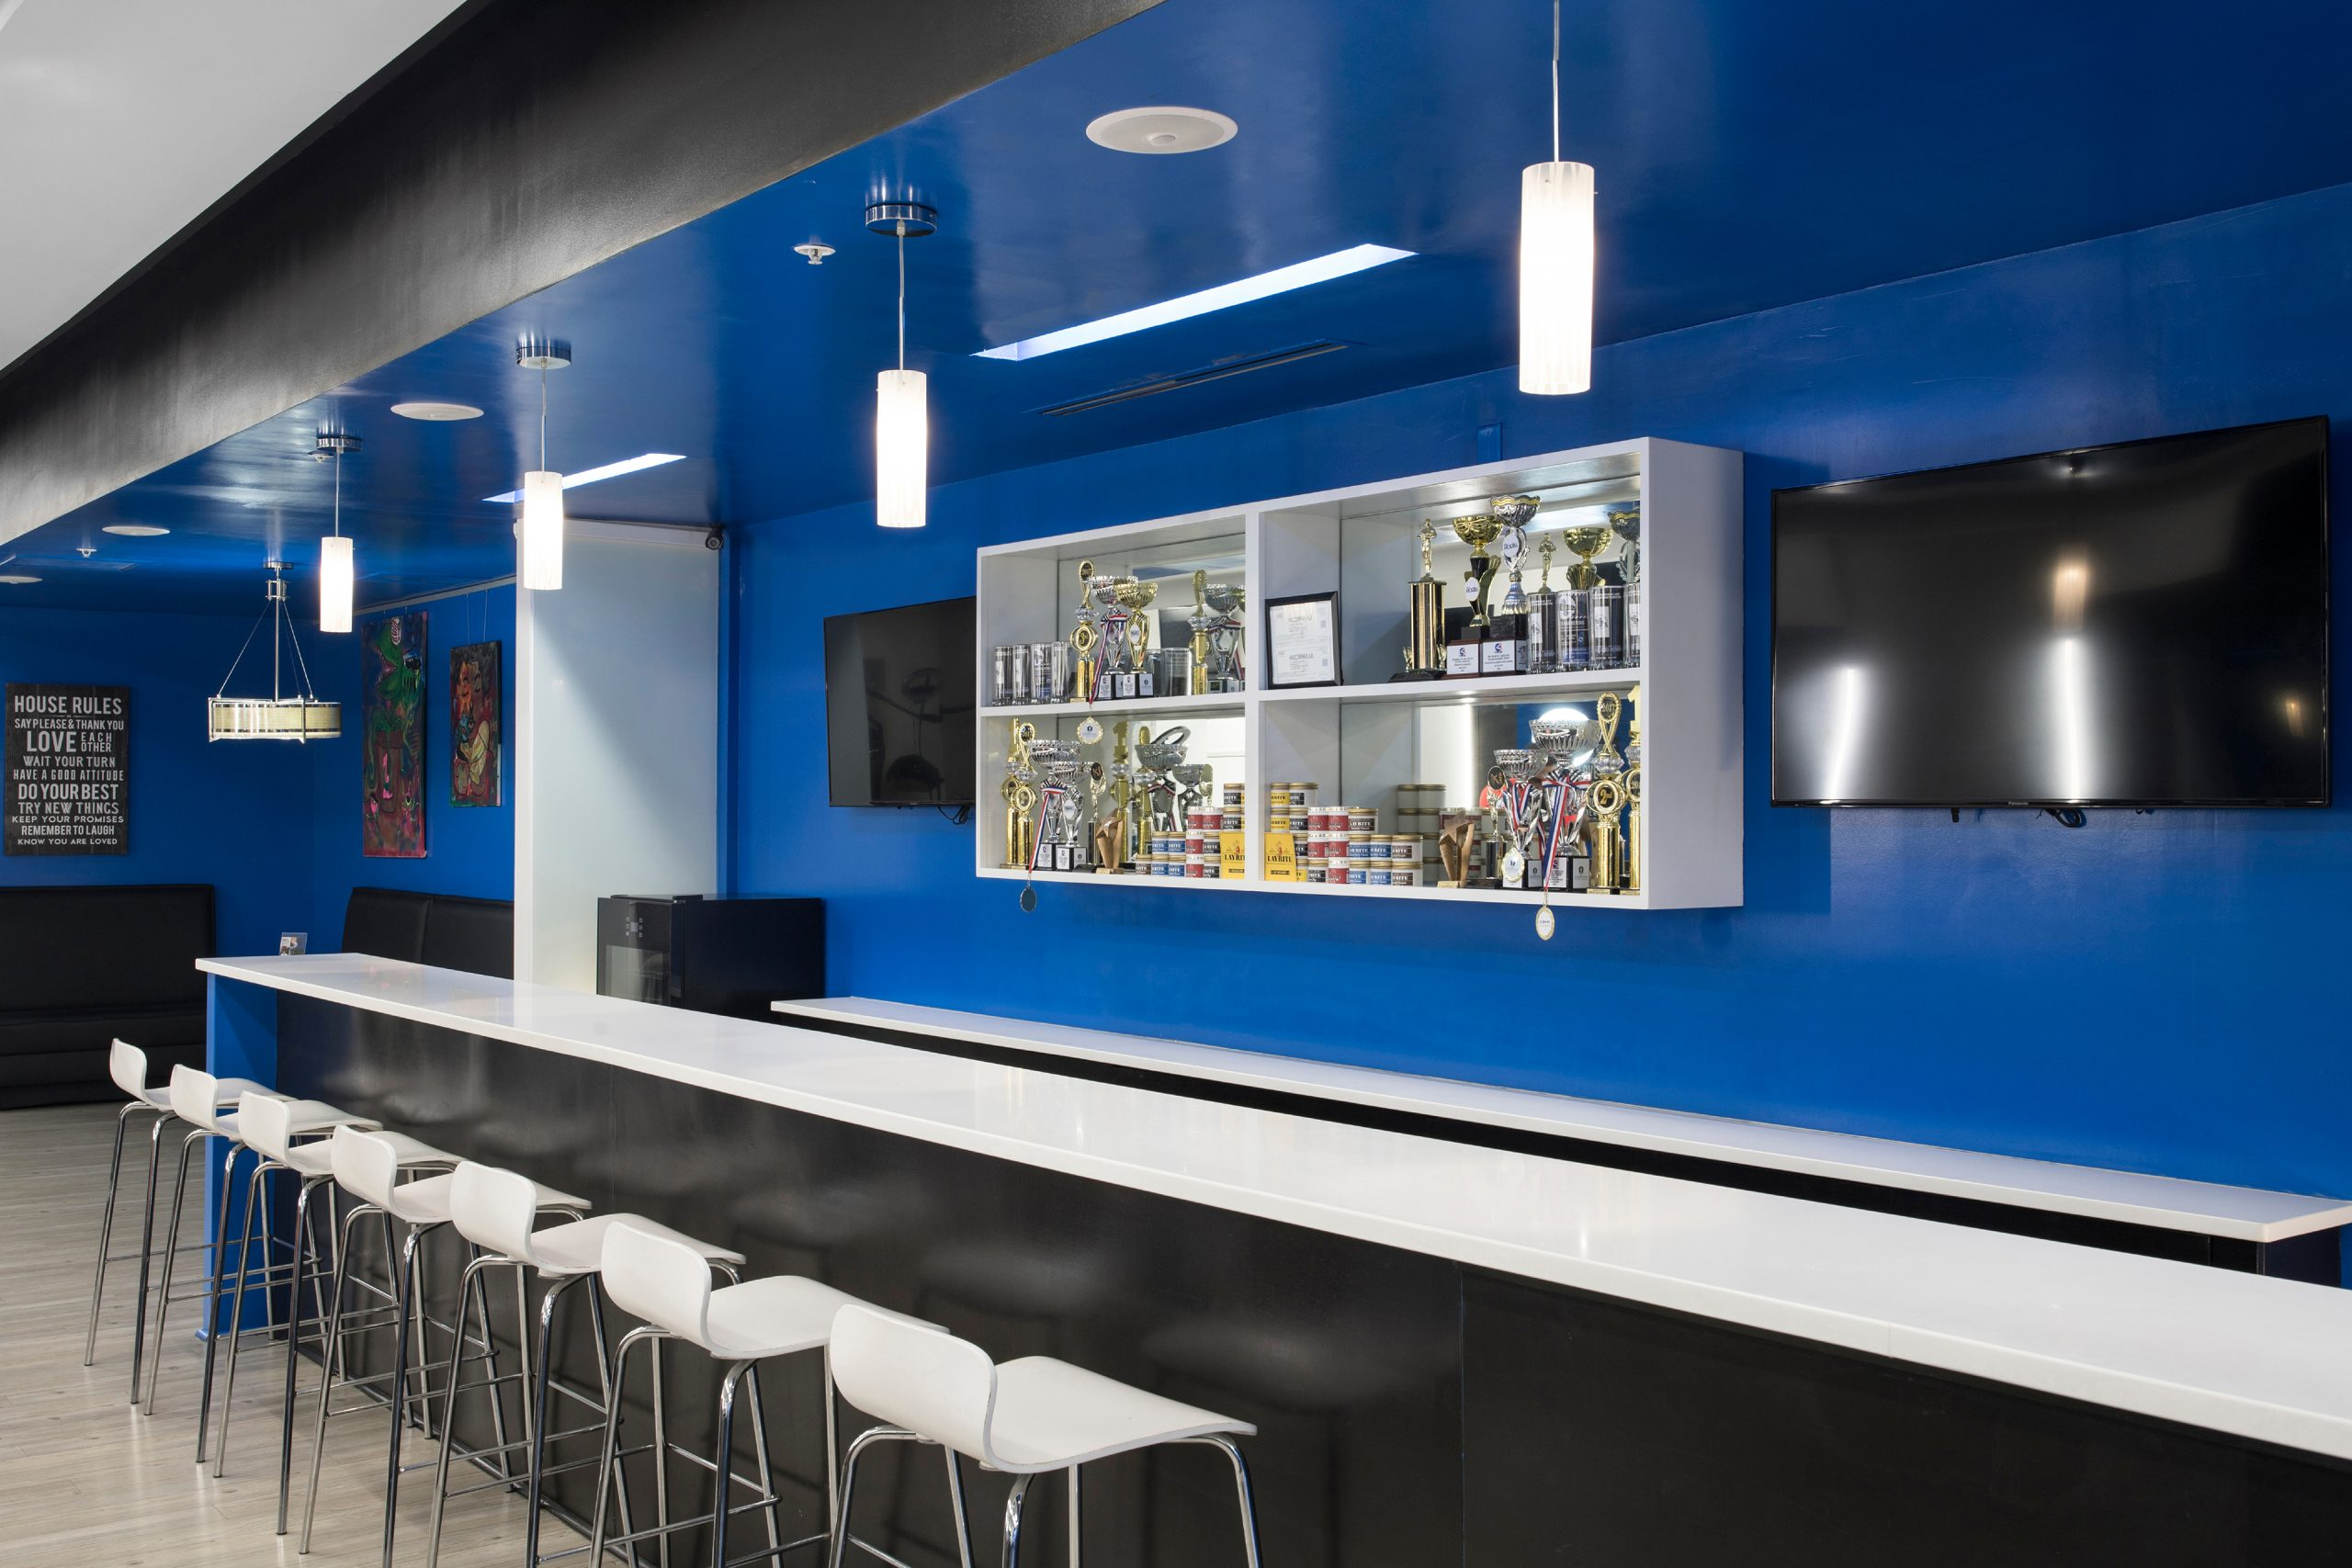 The Bar-Ber Shop 005